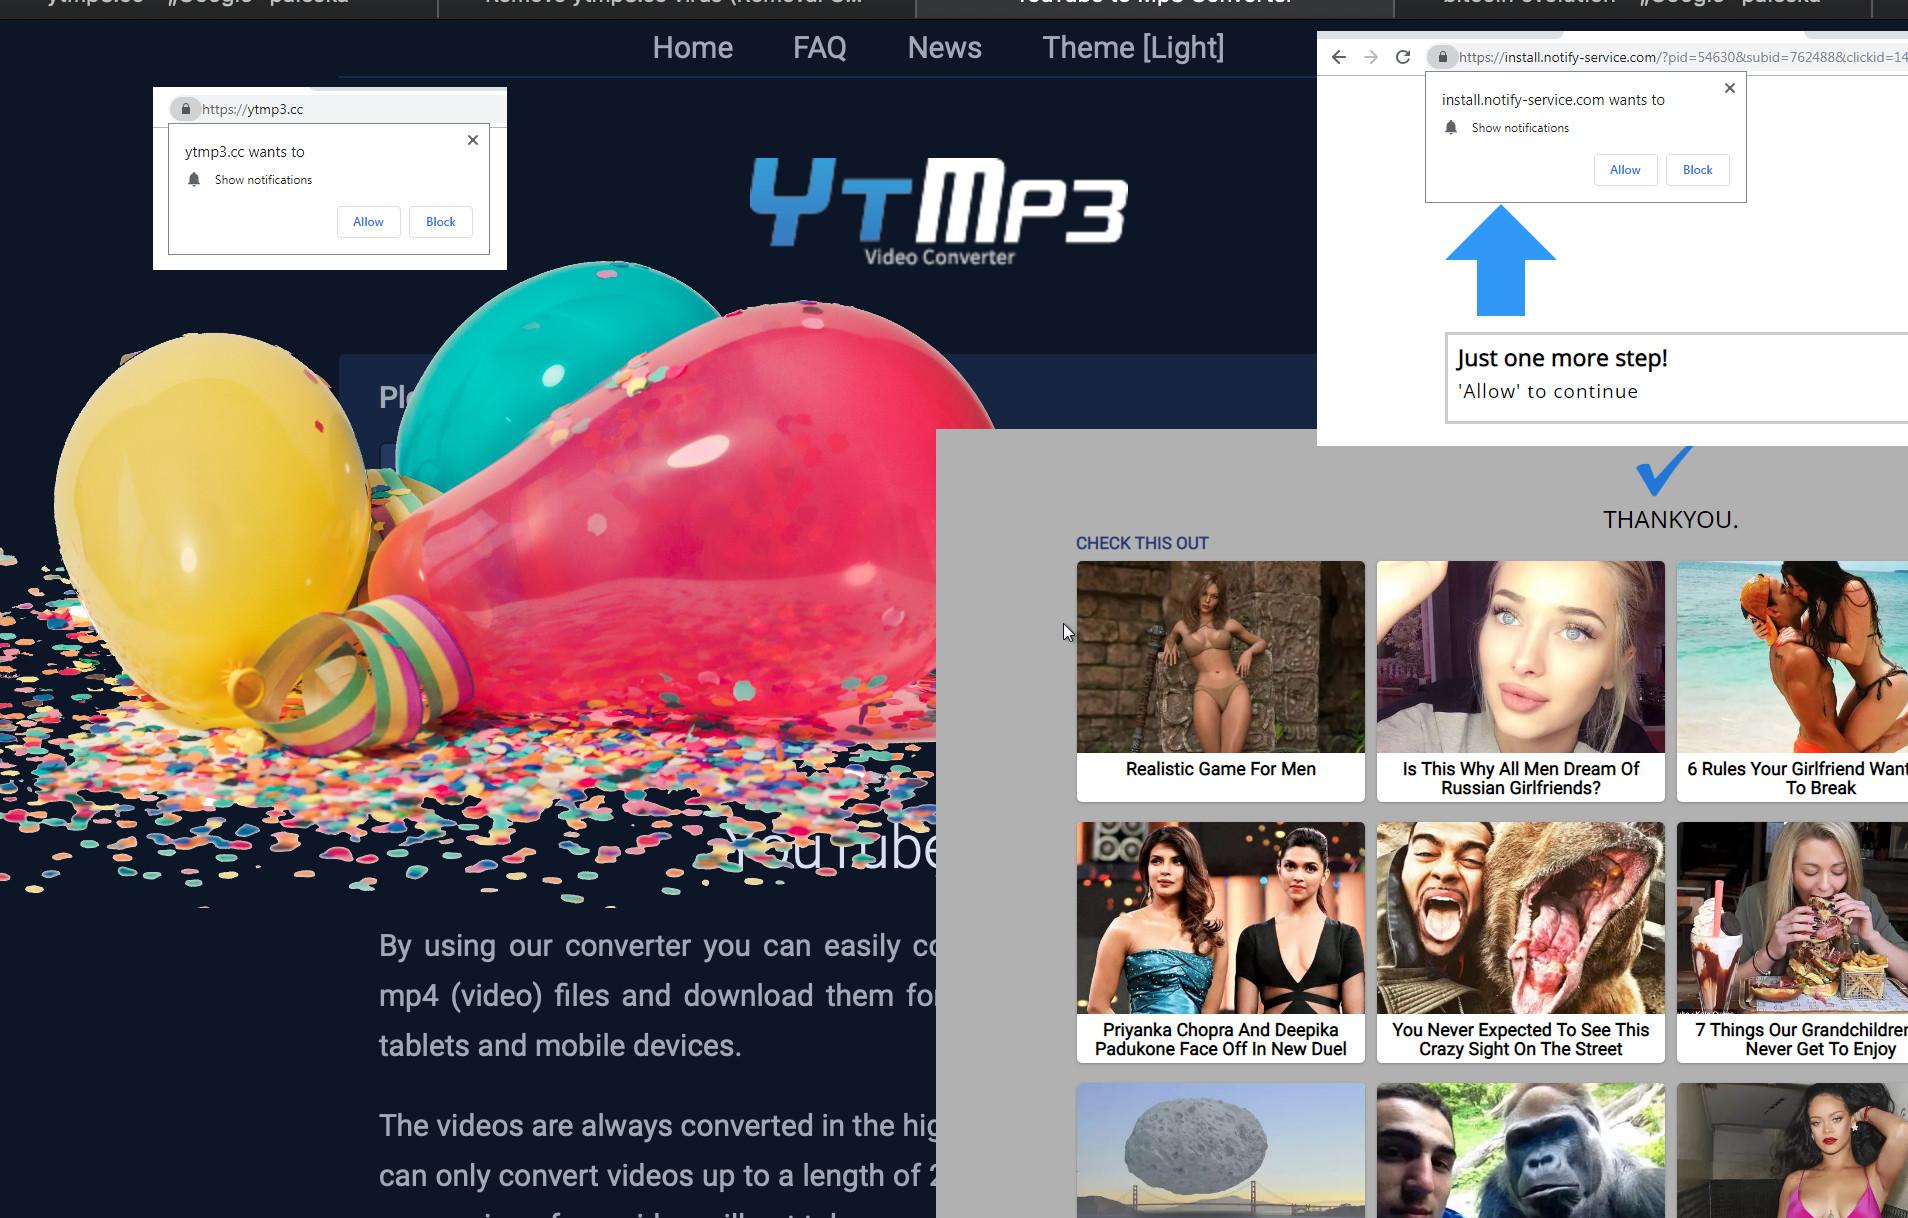 YTMp3 cc Virus - How to remove - 2-viruses com